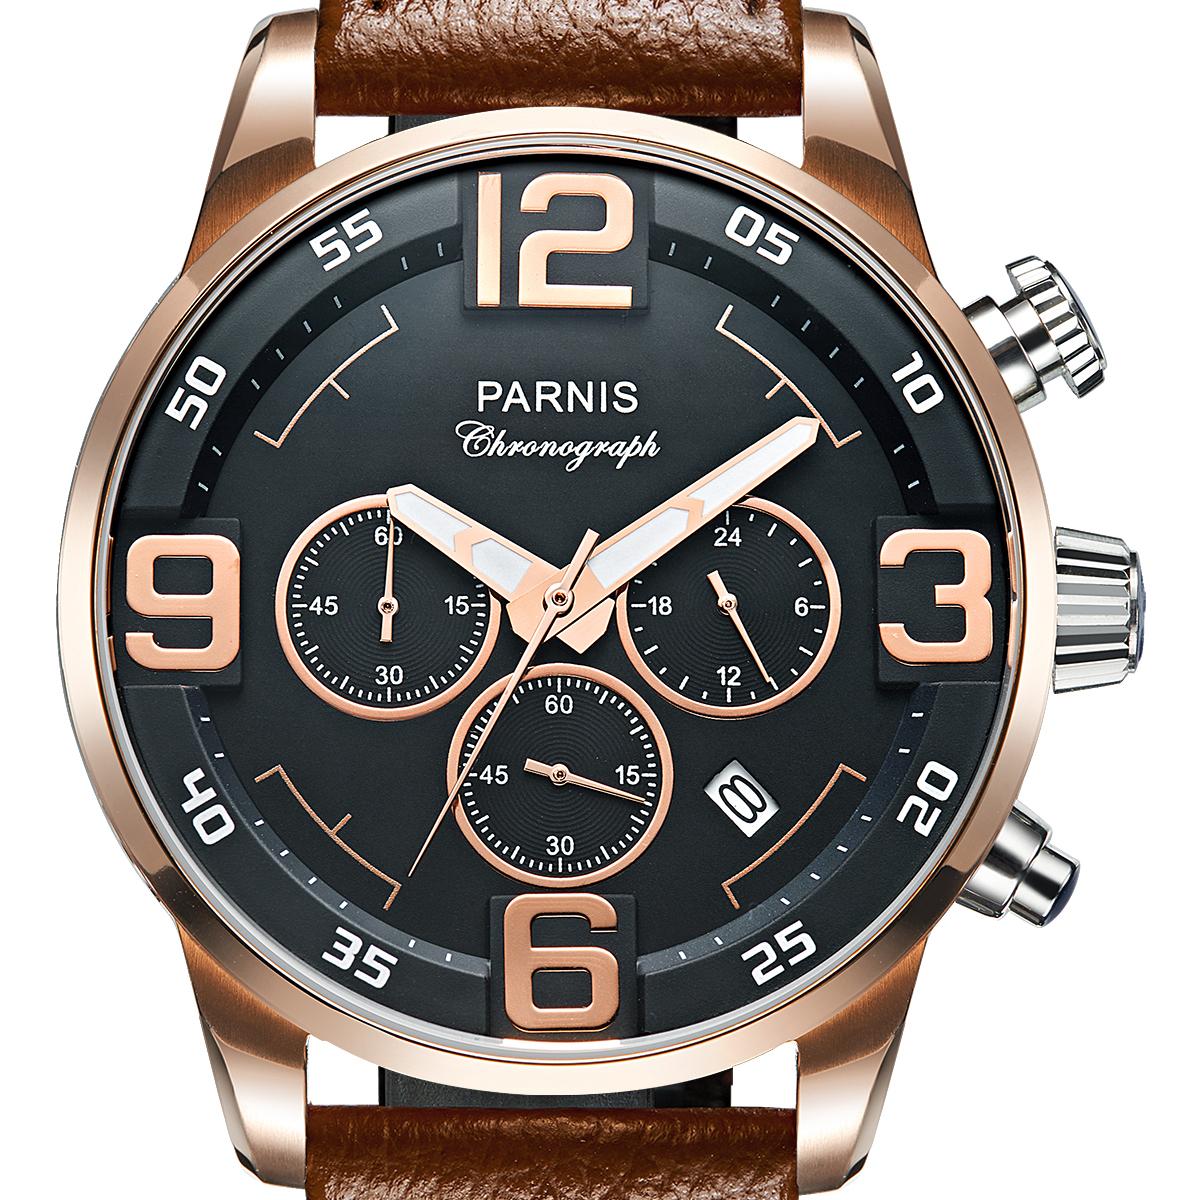 【NEW】PARNIS パーニス クォーツ 腕時計 [P6033-S6EL-RGBR] 並行輸入品 純正ケース メーカー保証12ヶ月